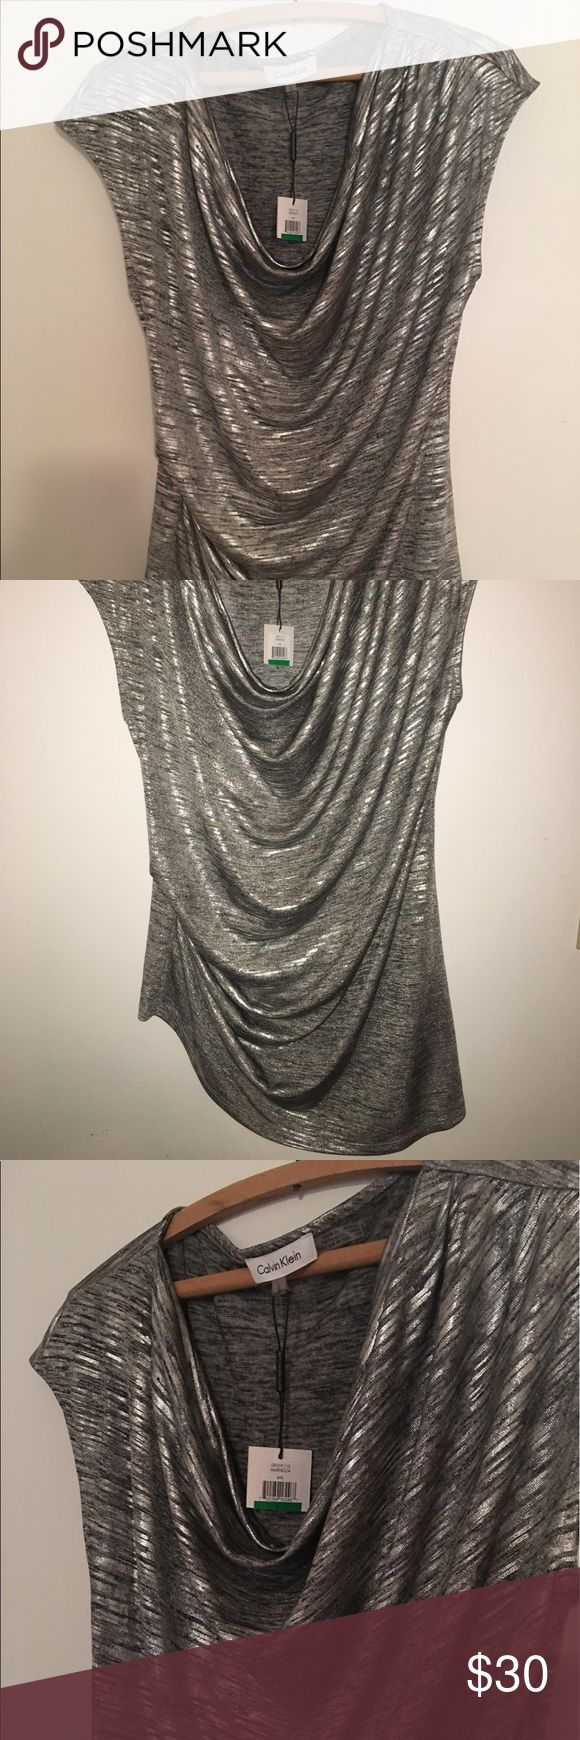 NWT Calvin Klein metallic blouse Brand new with tags Calvin Klein tank top. Never worn. Gorgeous tank top! Grey and silver metallic. Comfy stretchy material.  Classy and gorgeous!   #calvinklein #tanktop #metallic #brandnew #newwithtags #nwt #neverworn #womens #cowlneck #spring #summer Calvin Klein Tops Blouses